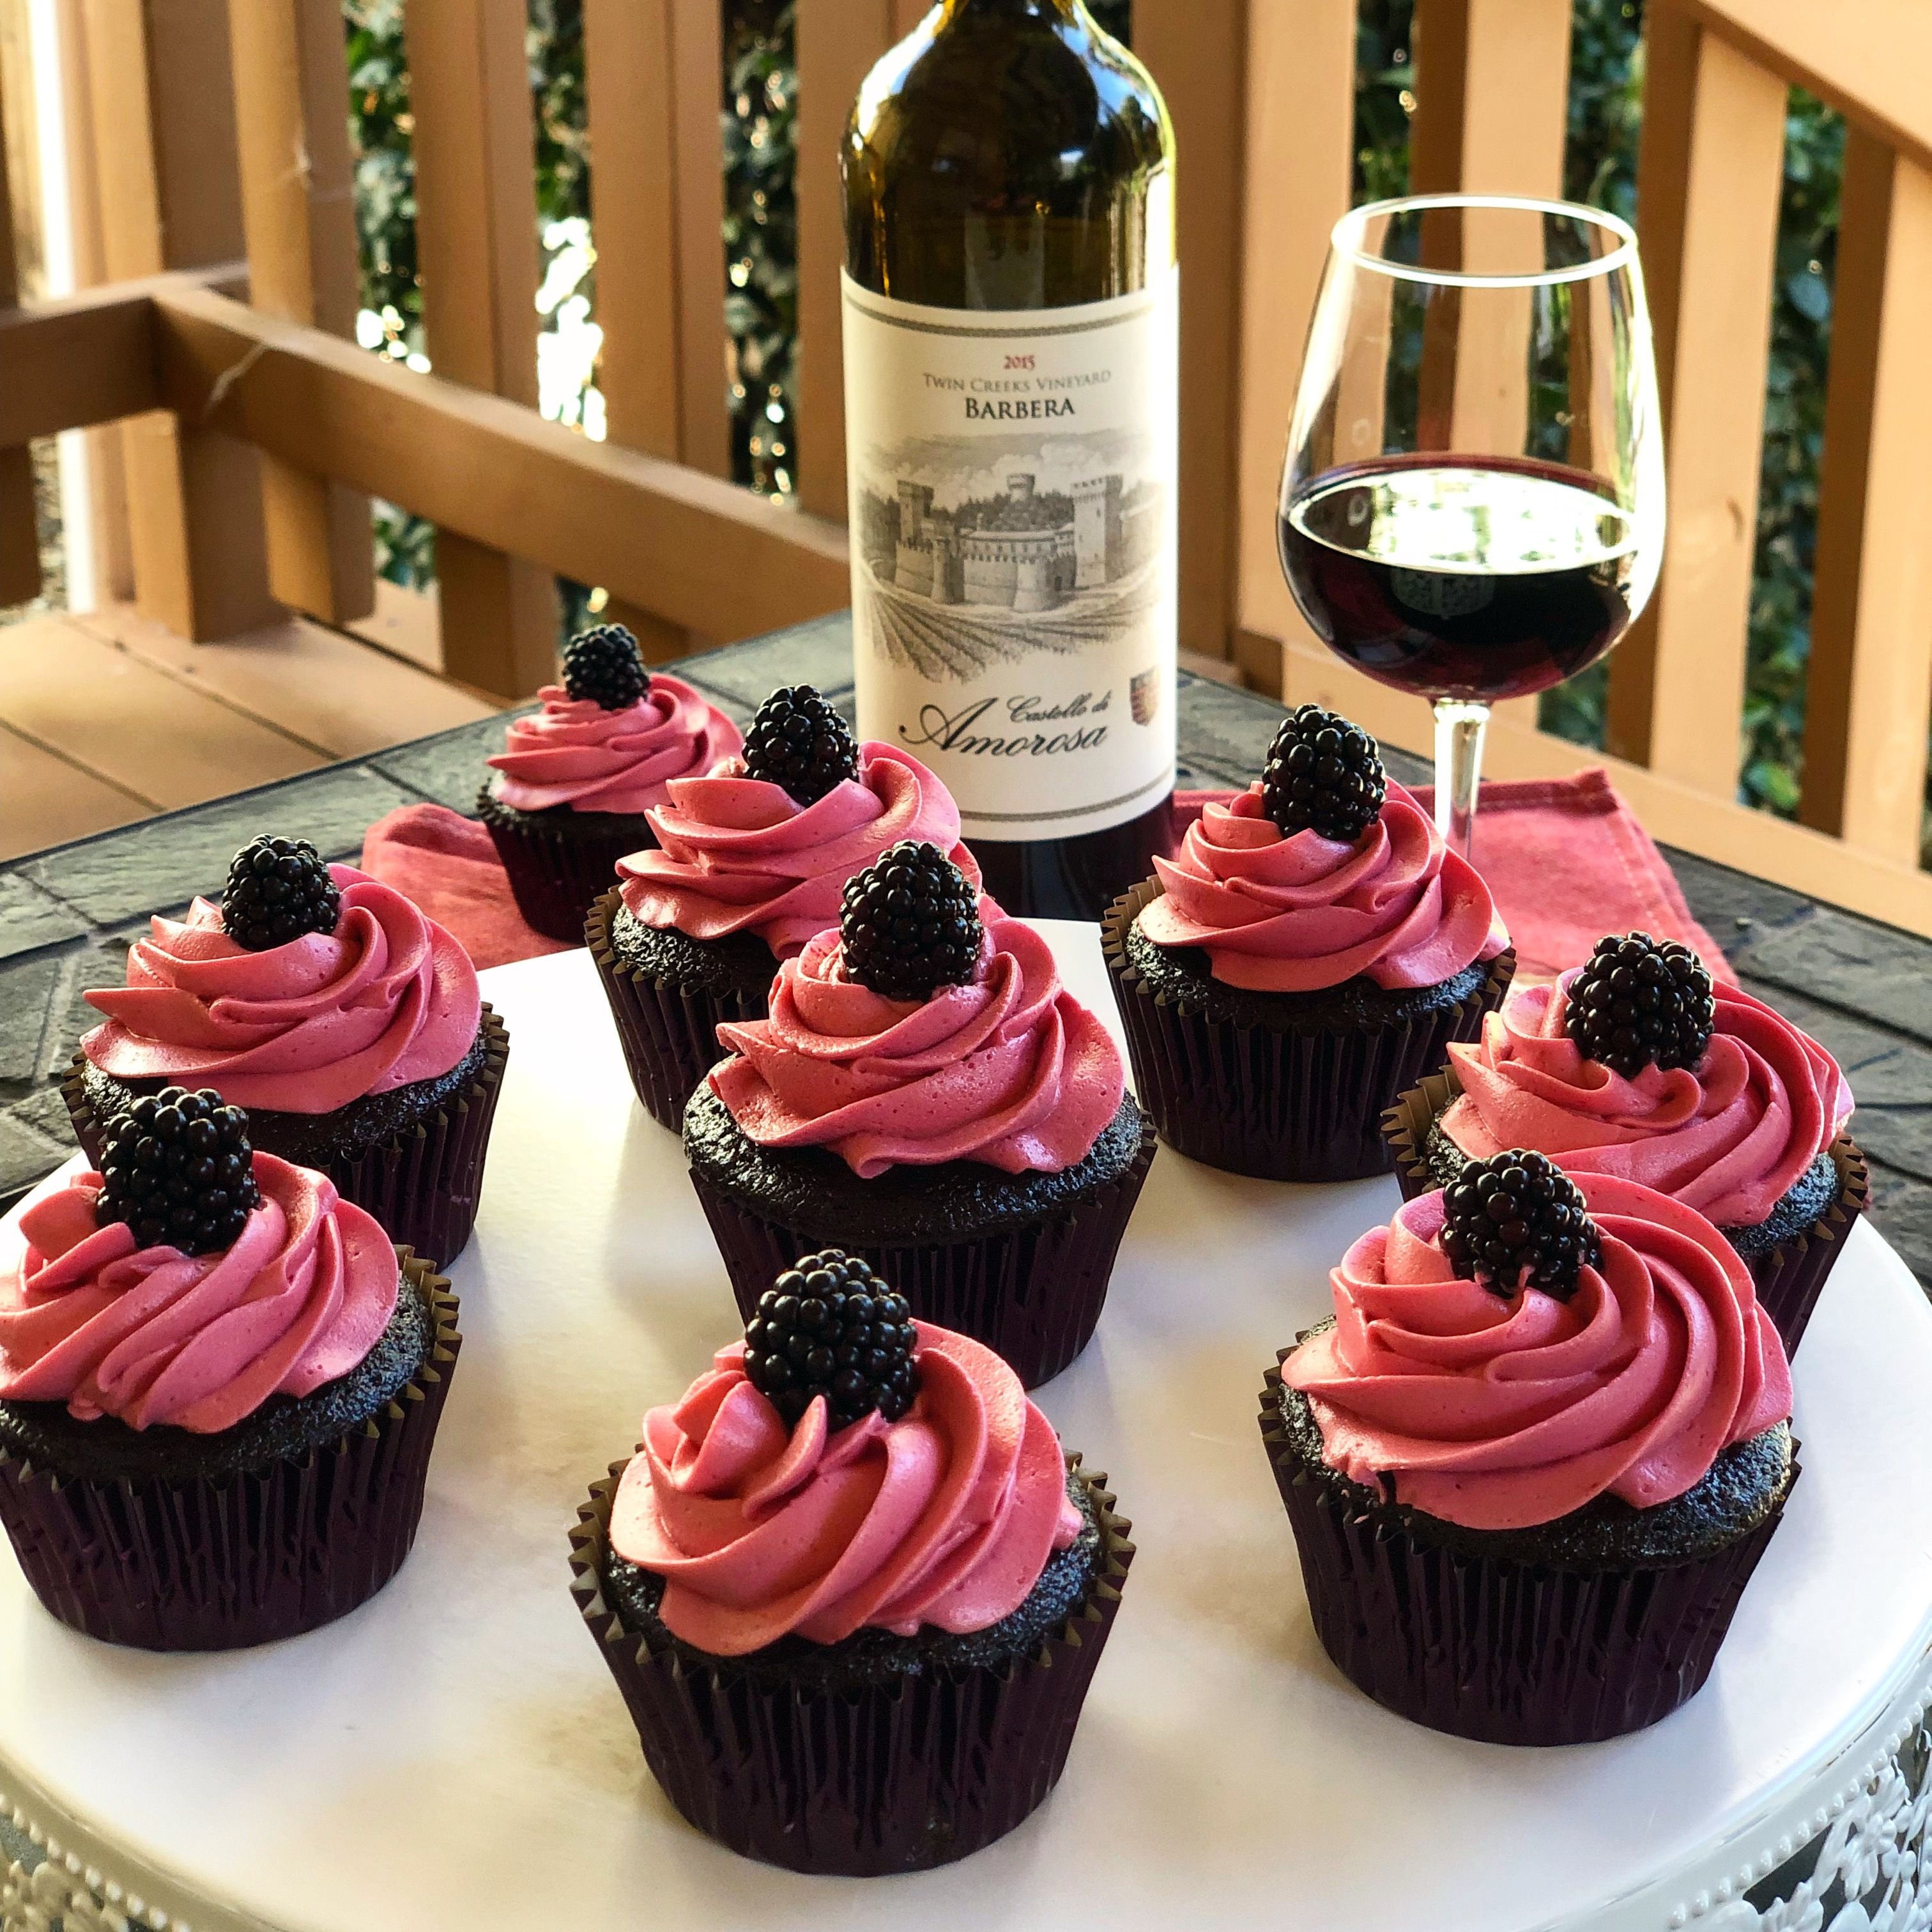 Items Similar To Cupcake Glasses On Etsy Wine Glass Crafts Painted Wine Glasses Hello Cupcake